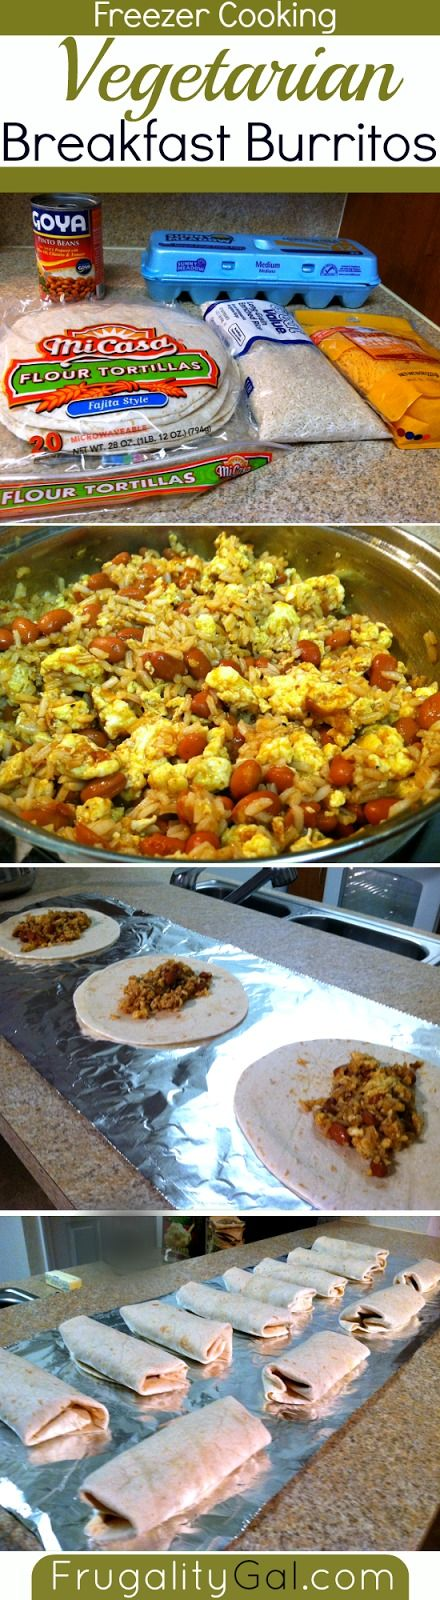 Freezer cooking: Vegetarian breakfast burritos. Tasty, filling and ...